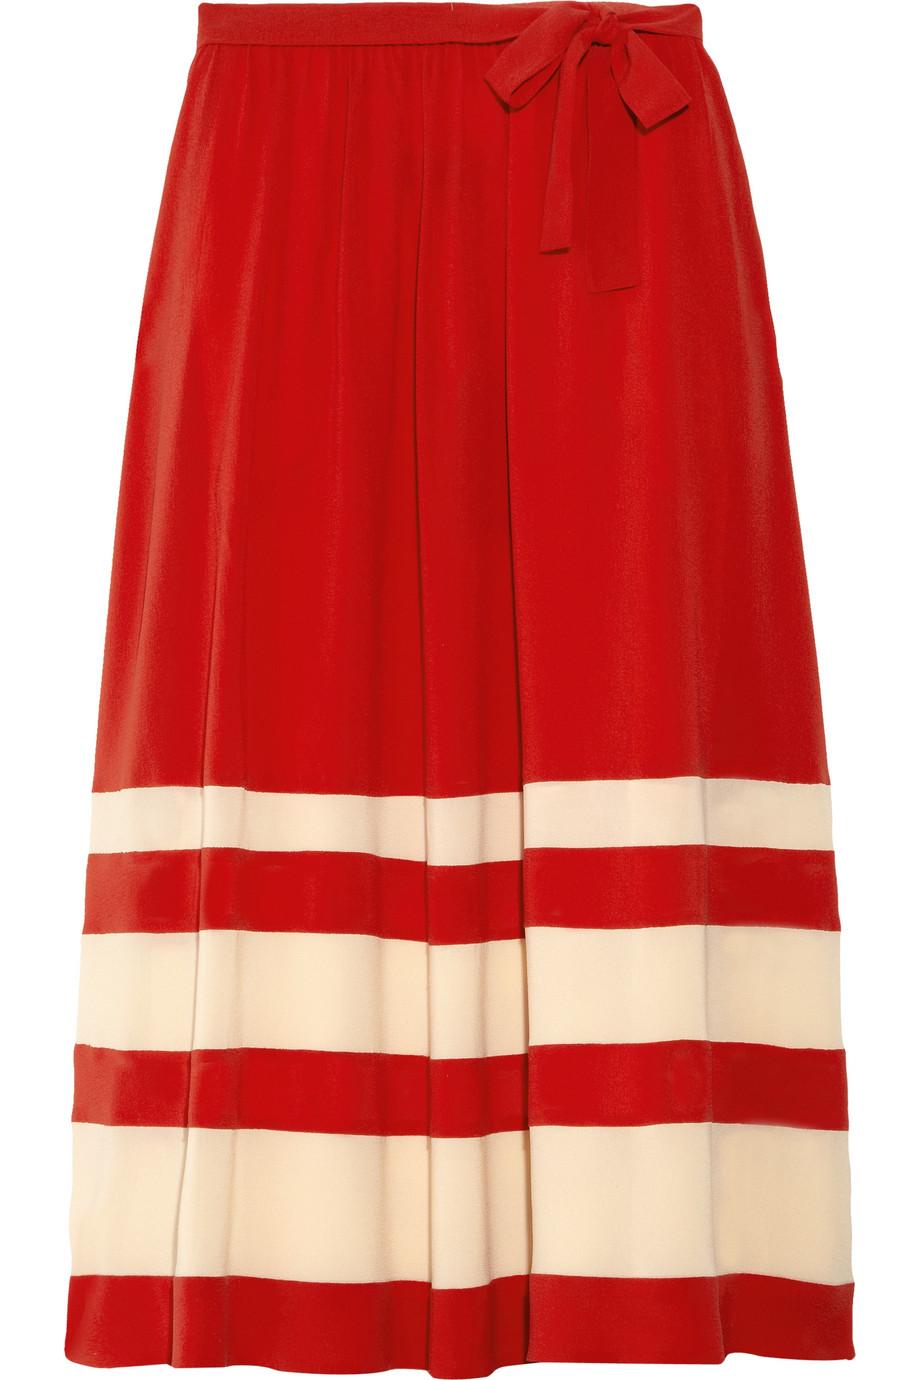 rykiel striped silk crepe midi skirt in lyst